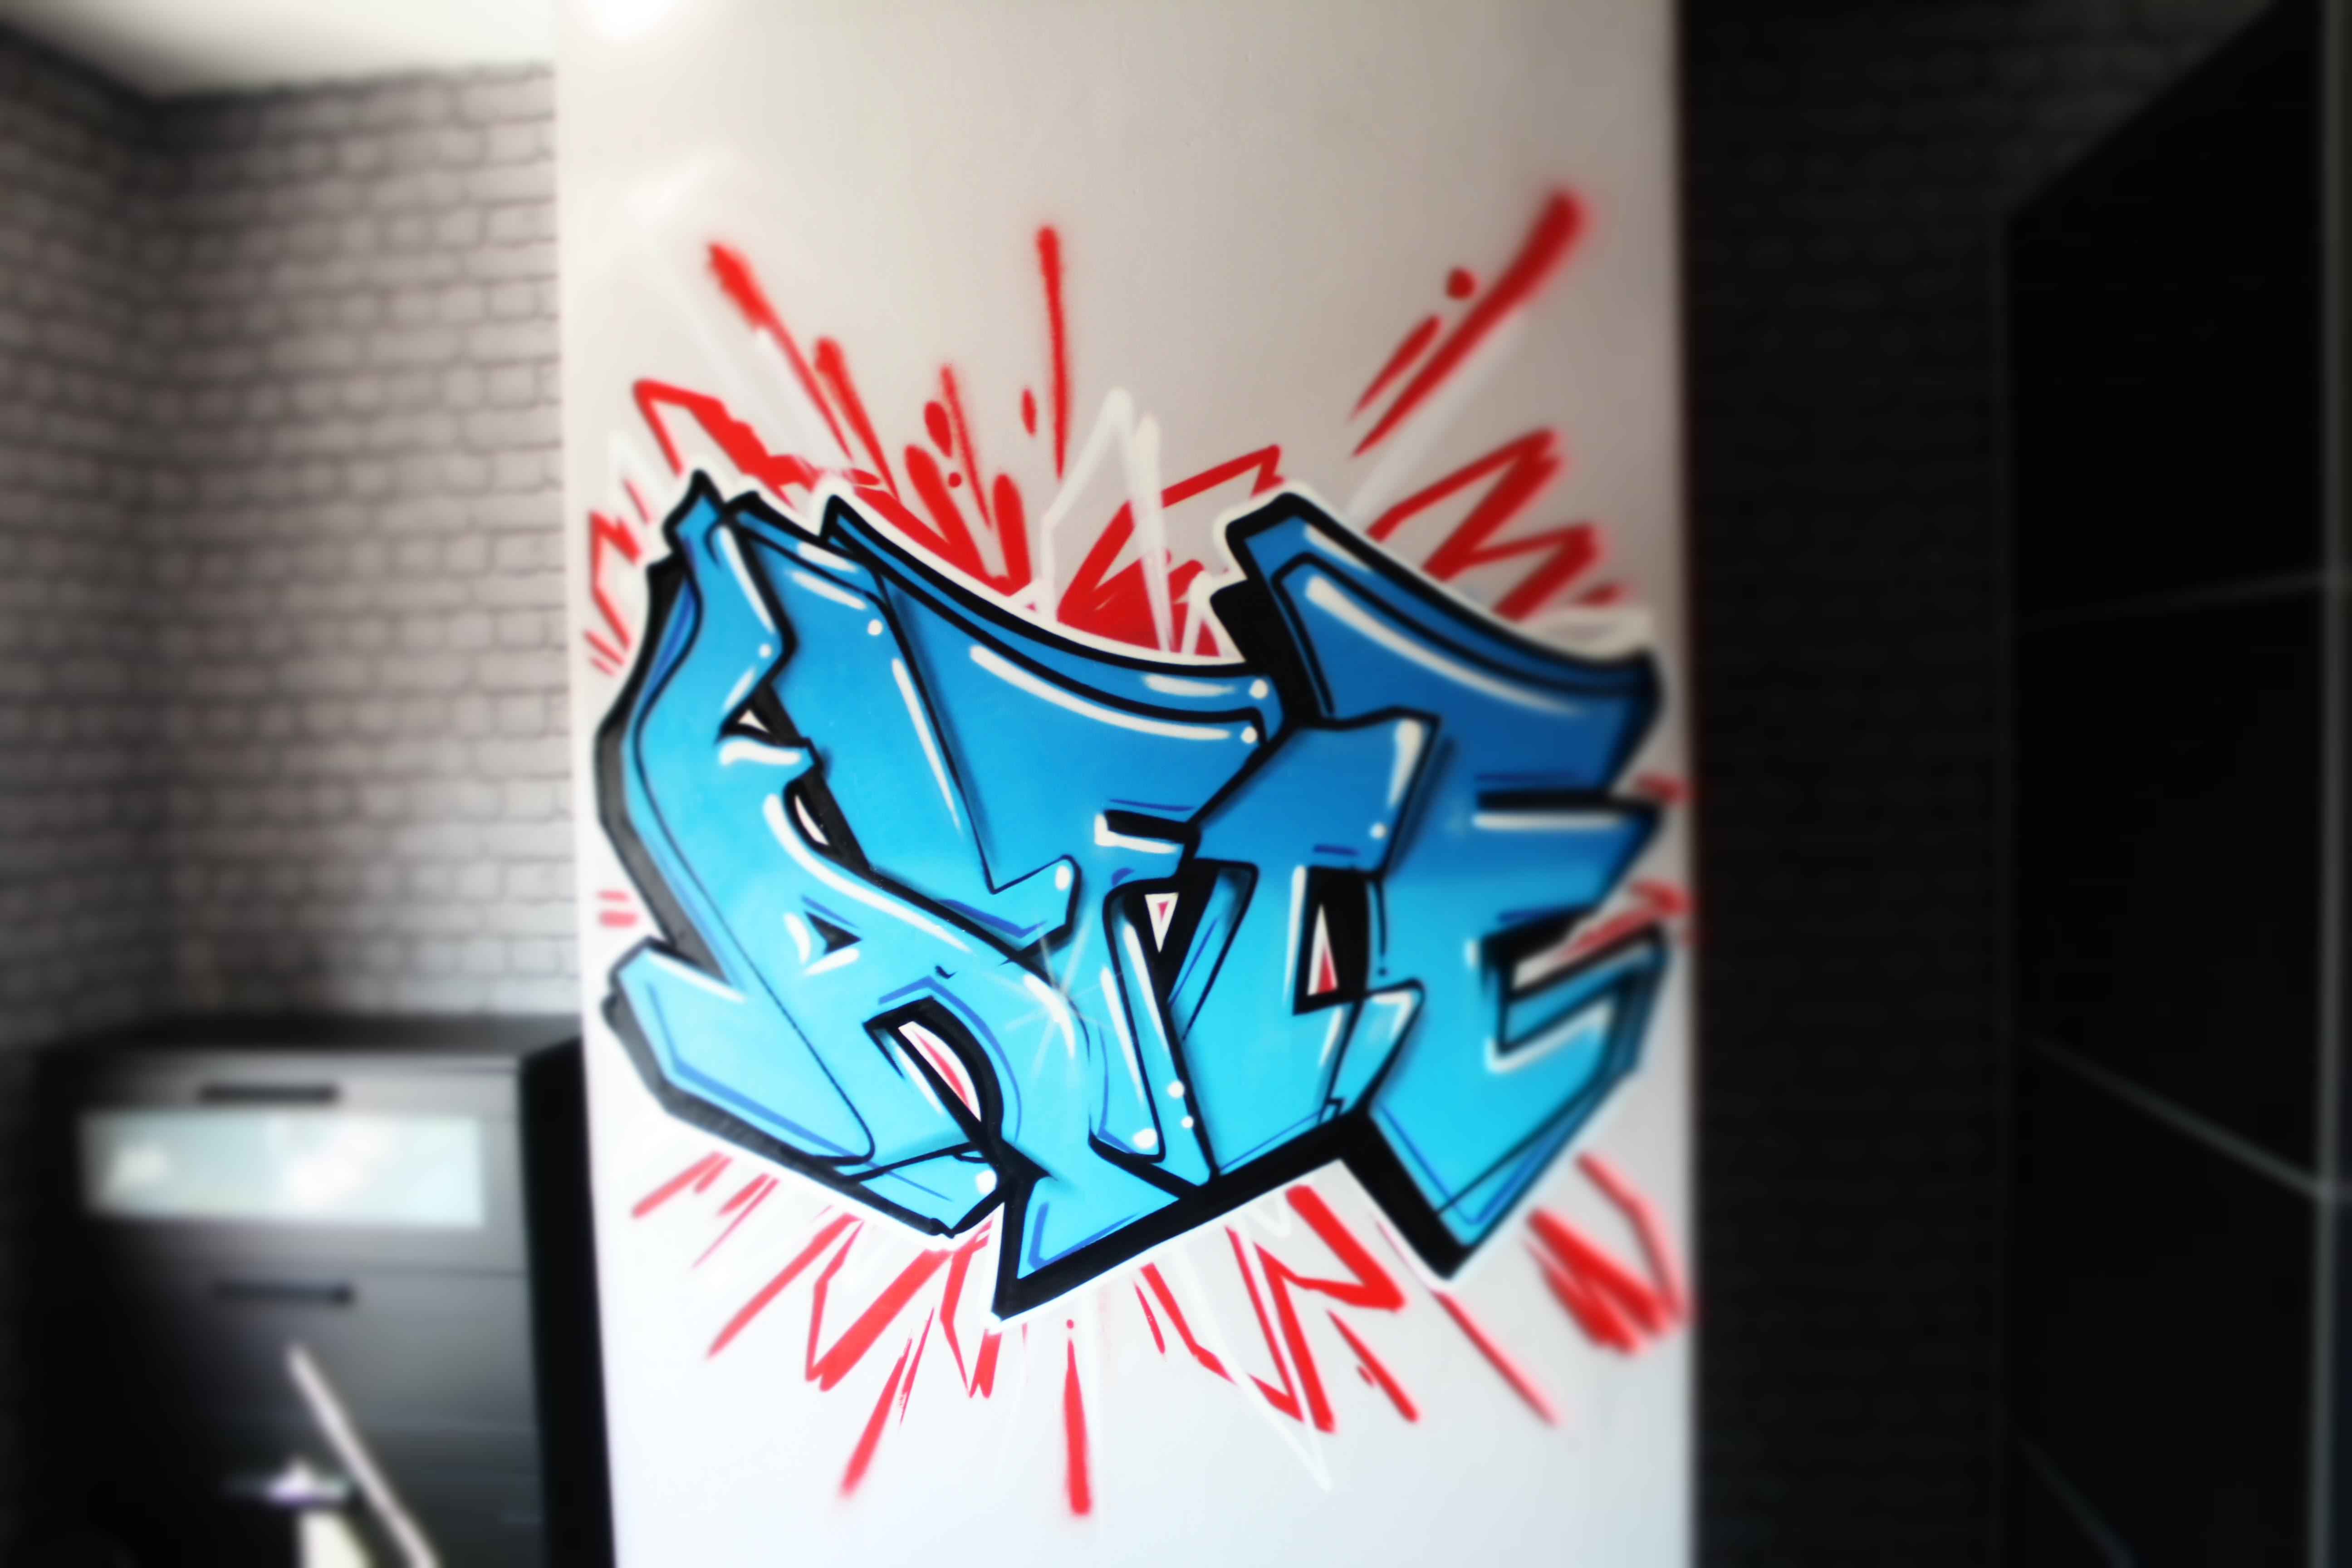 Graffiti Bedroom | Graffiti Press